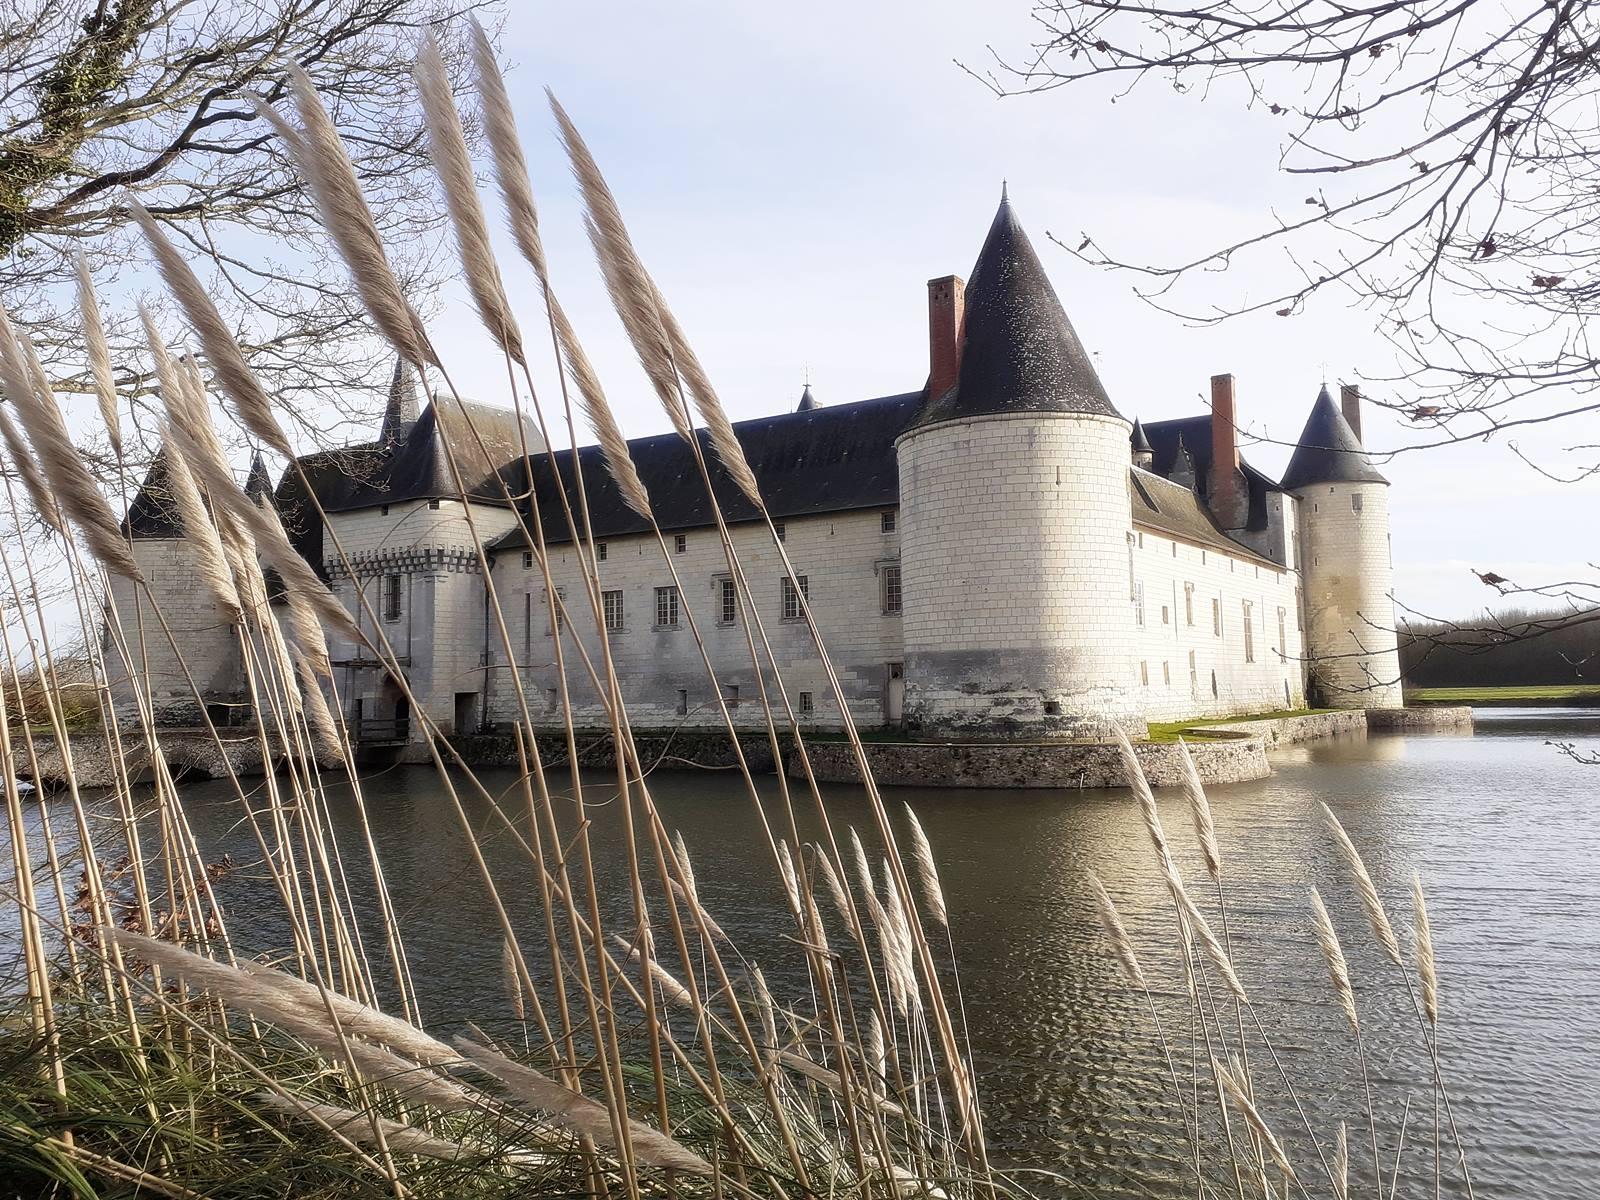 Chateau plessis bourre maine loire tourisme20200222 165131